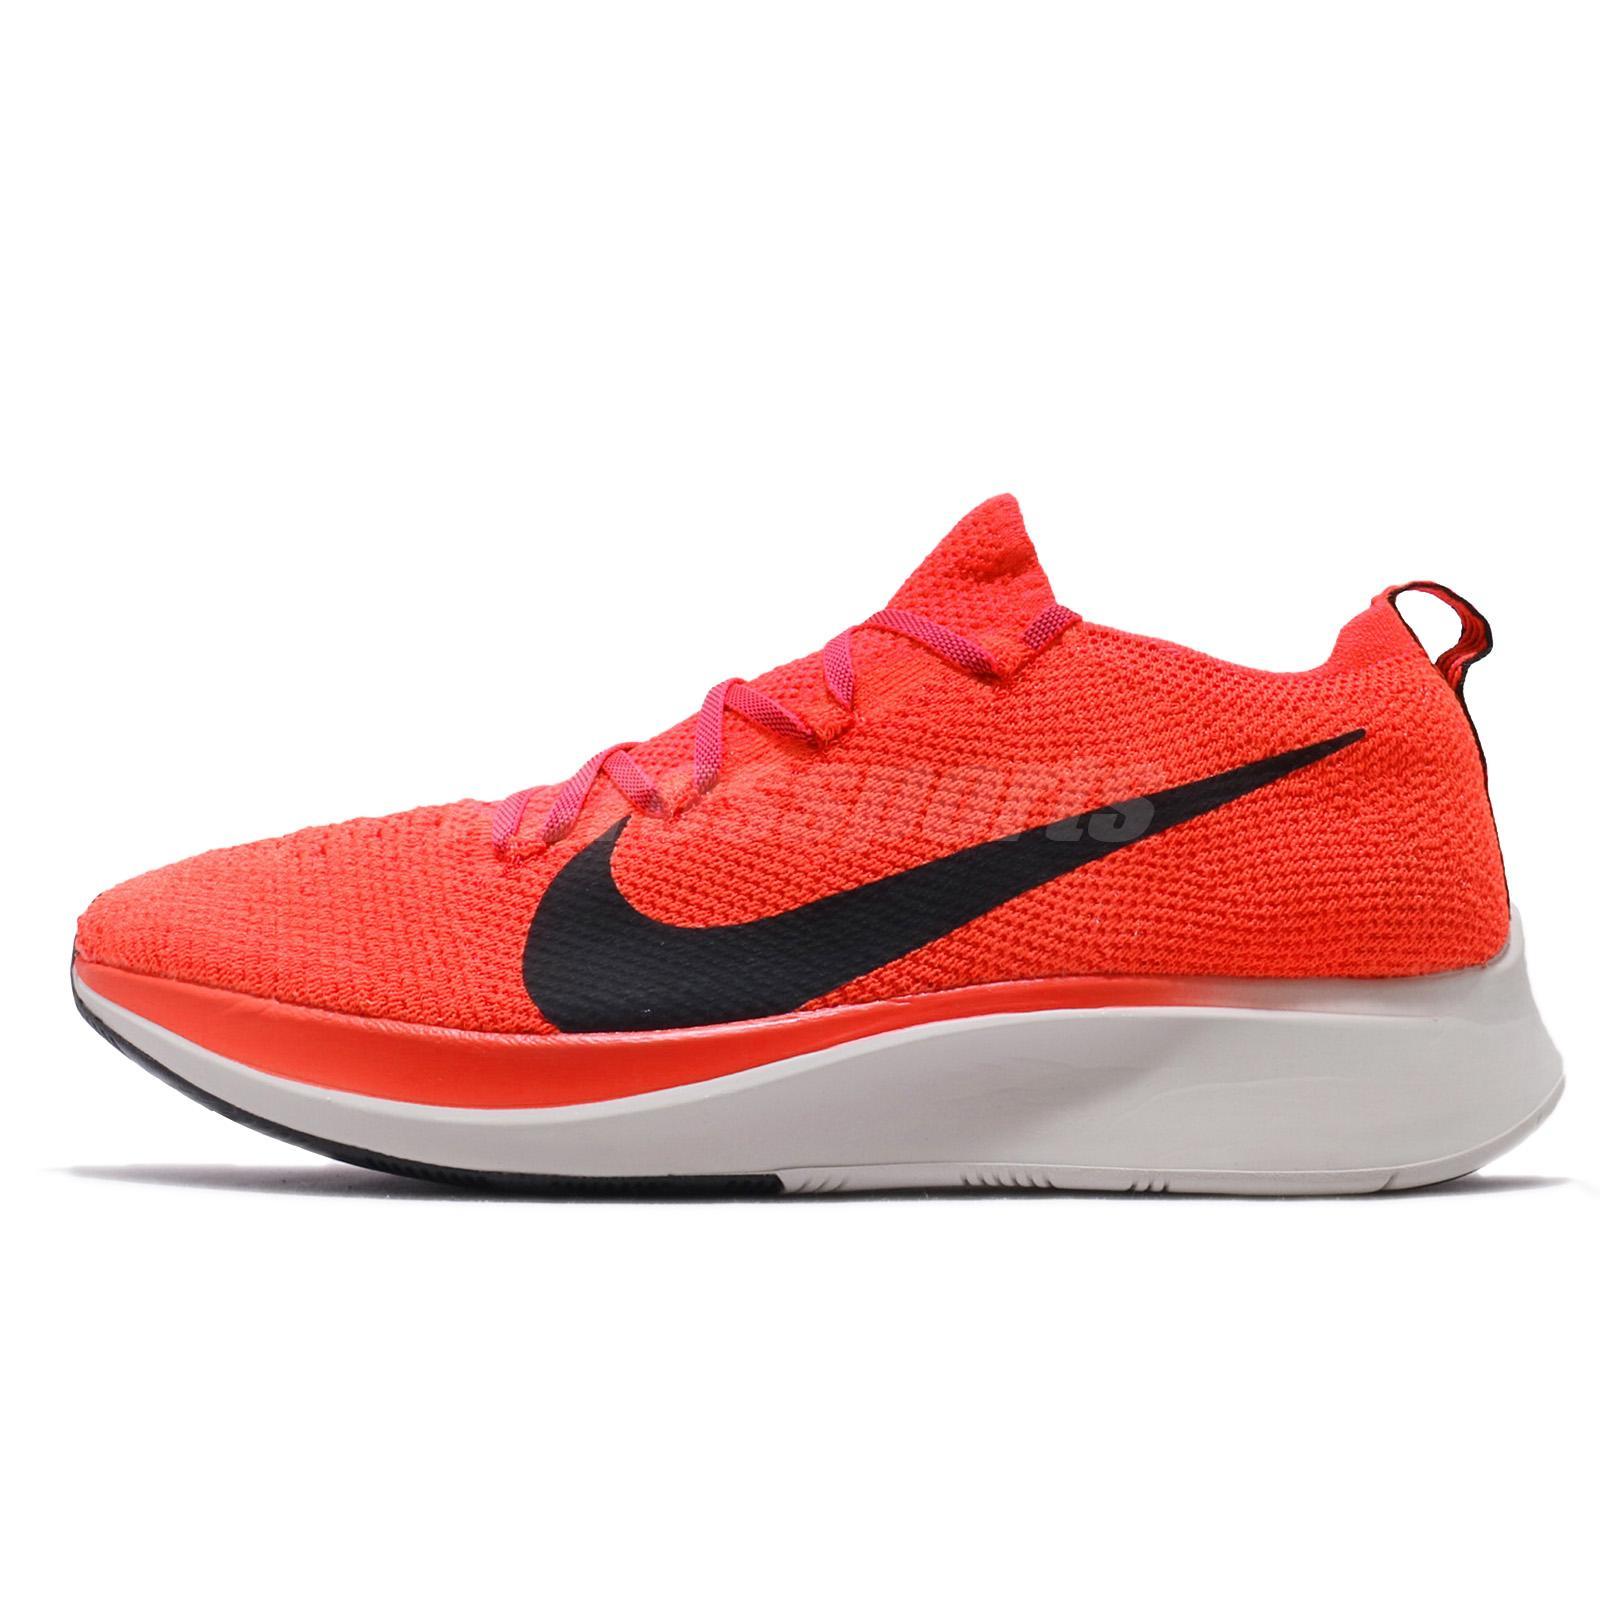 24ff844f3ea5 Nike Zoom Fly FK Flyknit Bright Crimson Black Men Running Shoes AR4561-600